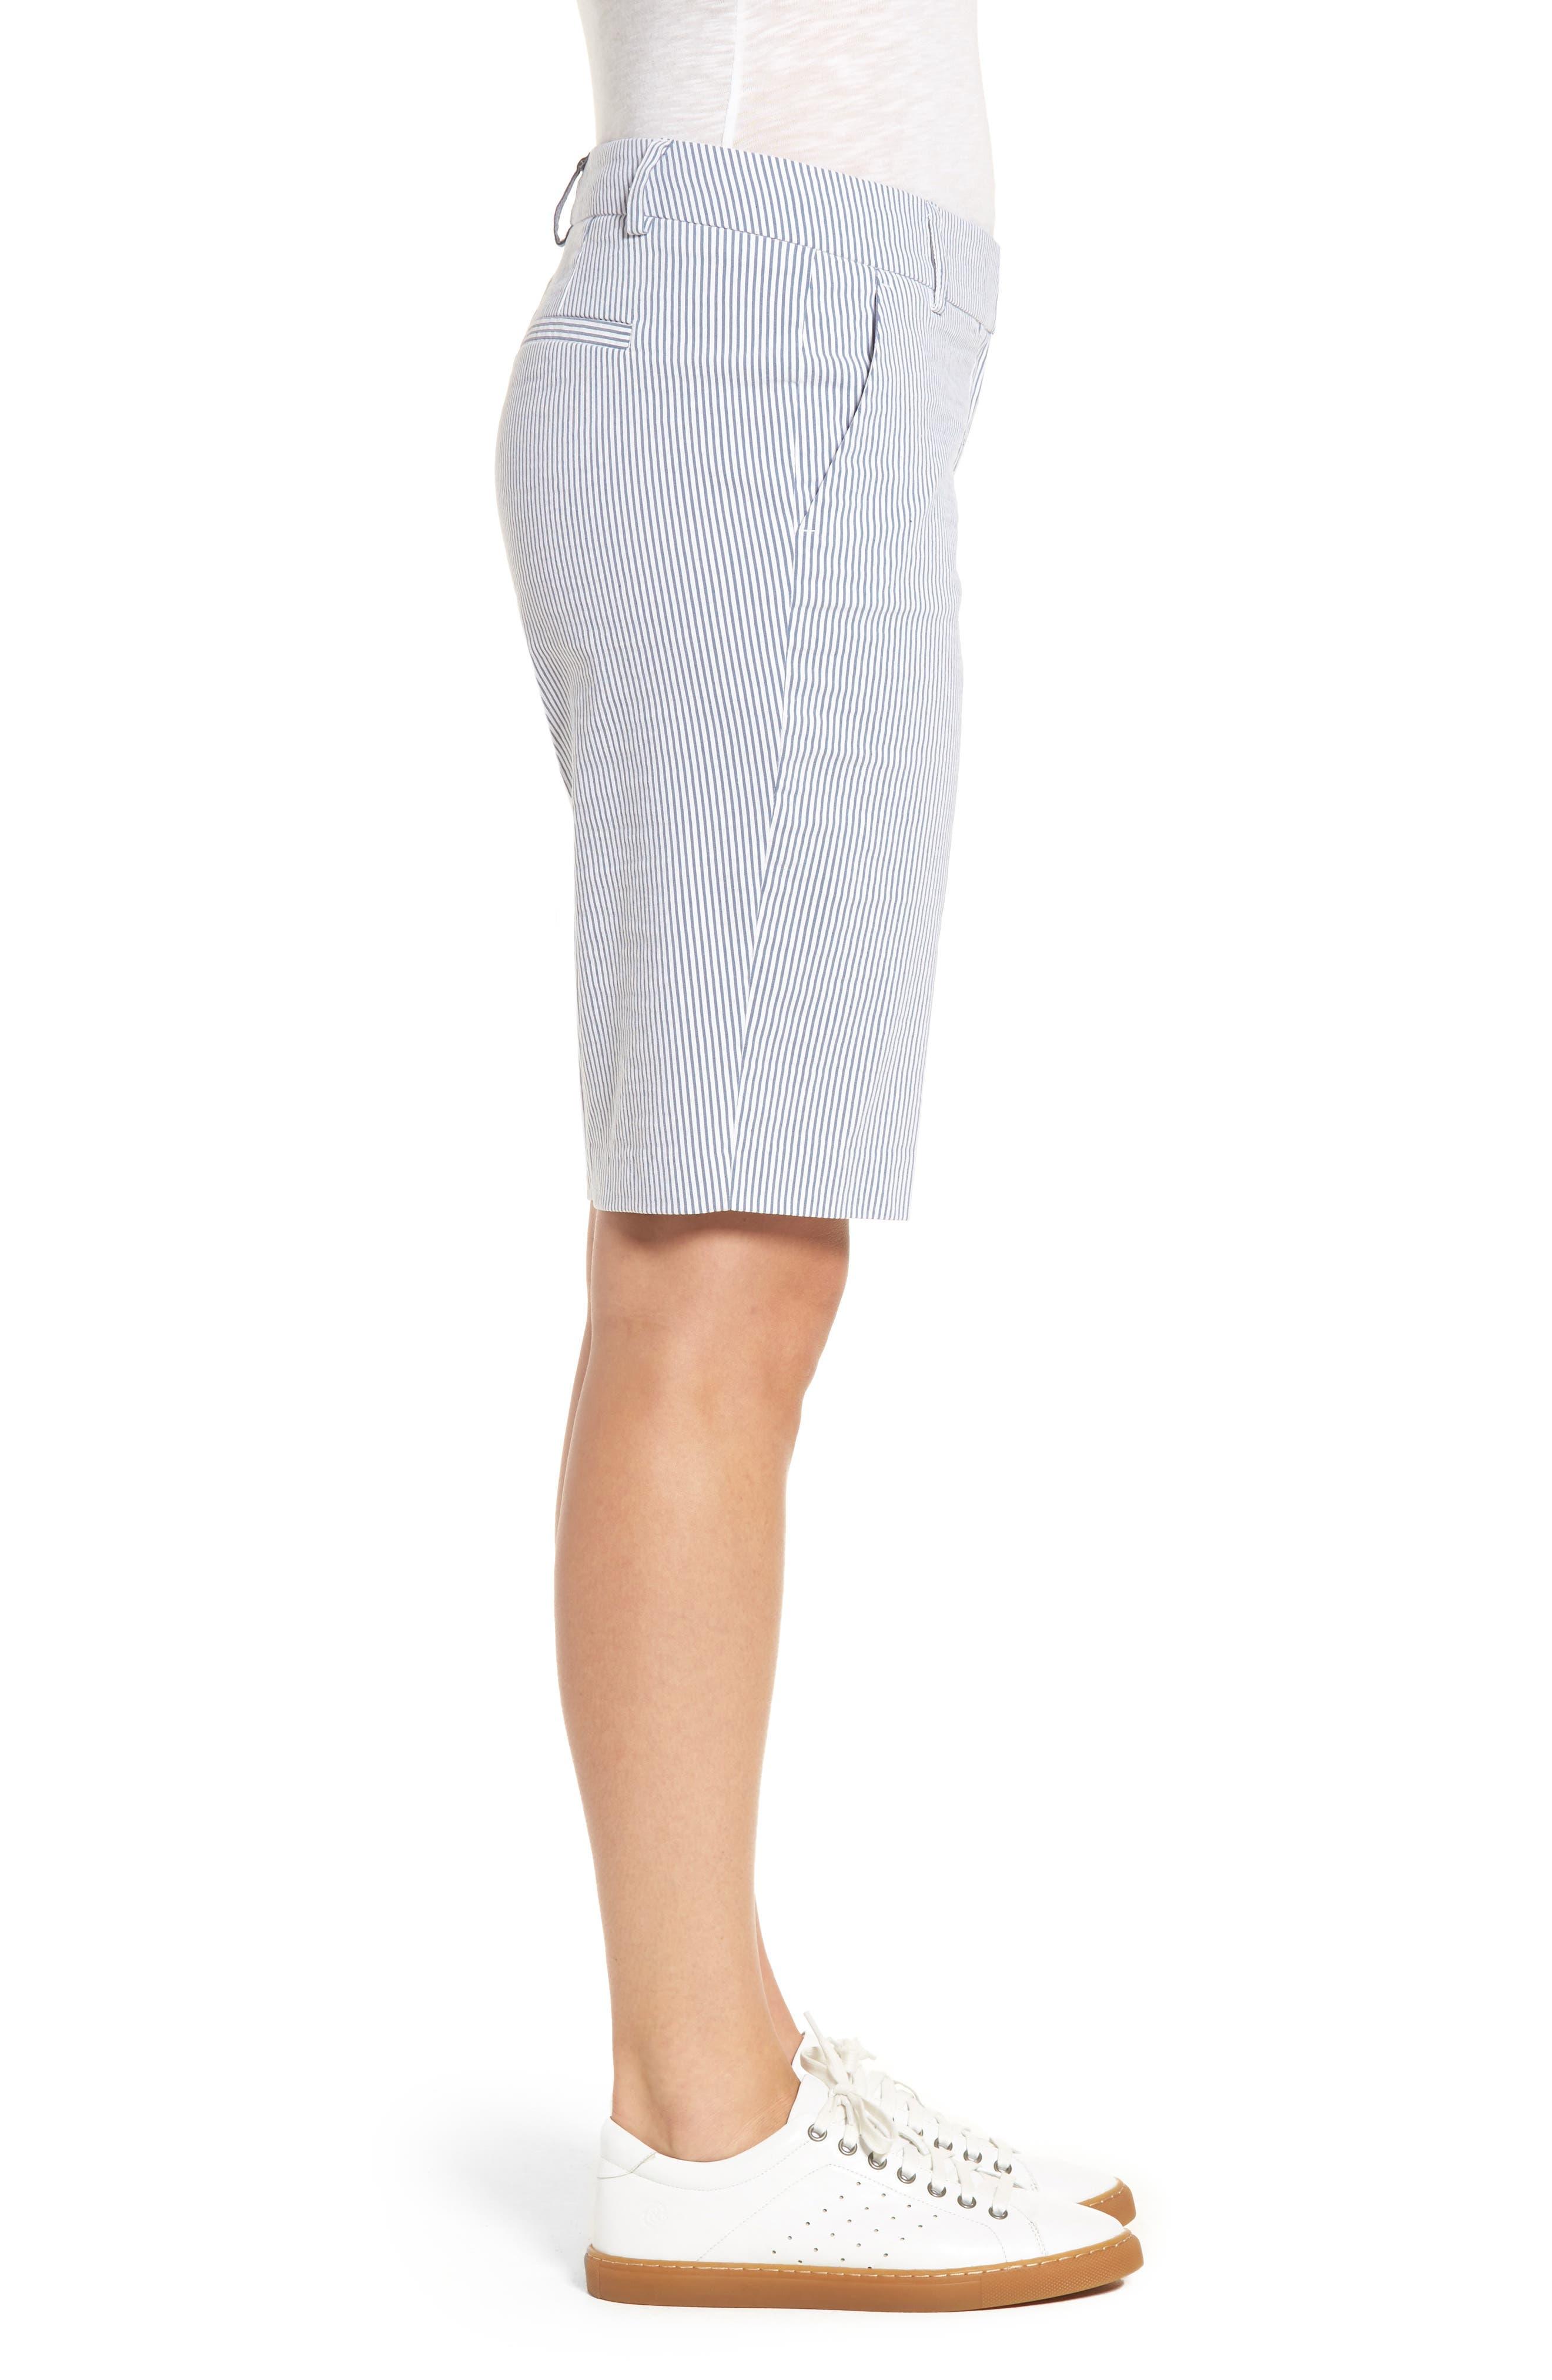 Stretch Bermuda Shorts,                             Alternate thumbnail 3, color,                             Blue- White Seersucker